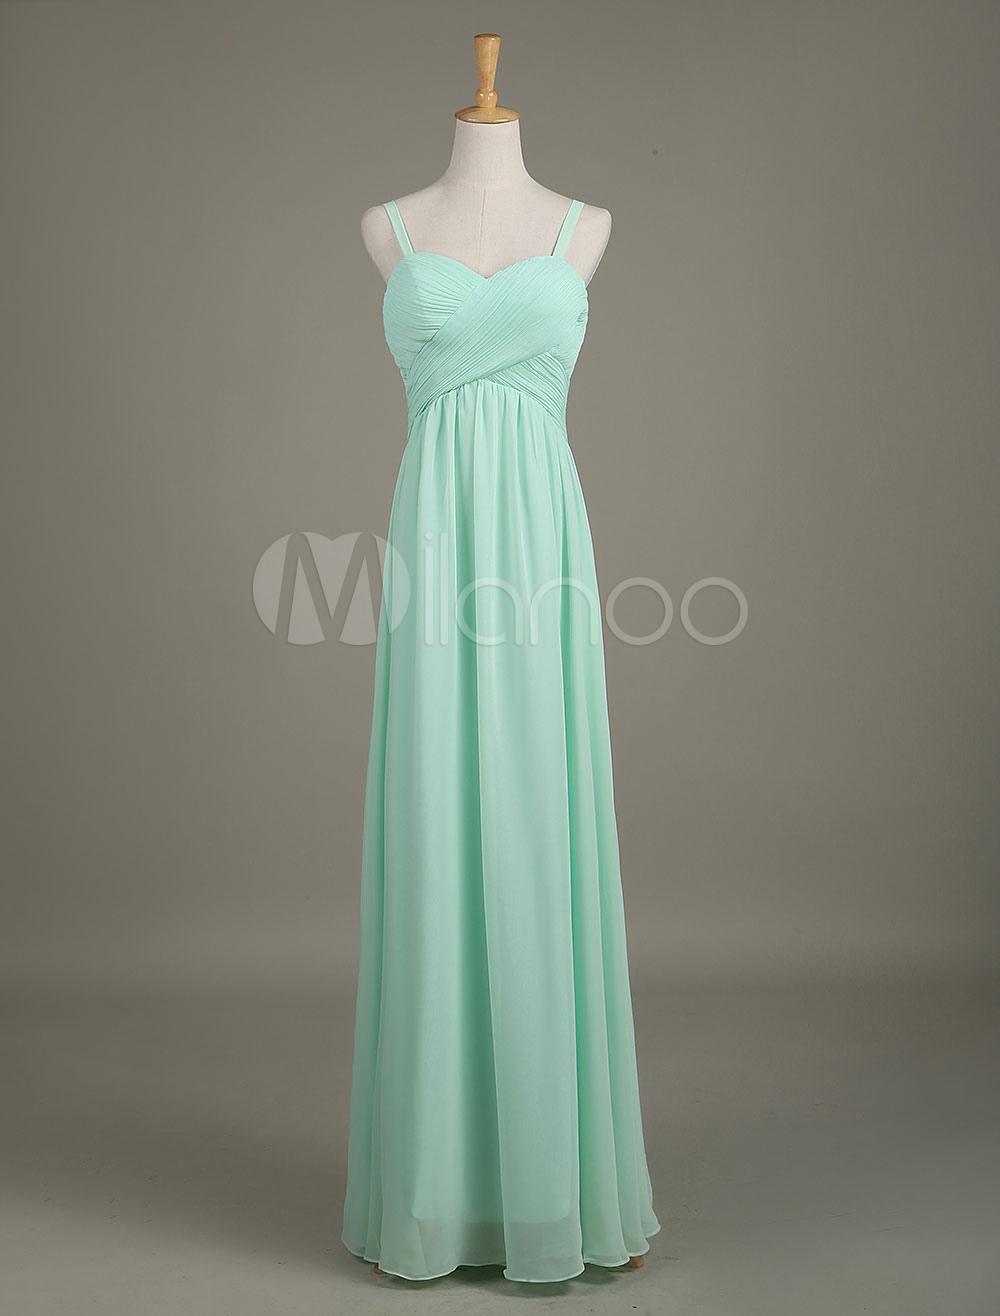 Mint Green Bridesmaid Dress Sweetheart Chiffon Straps Draped A Line Long Wedding Party Dress